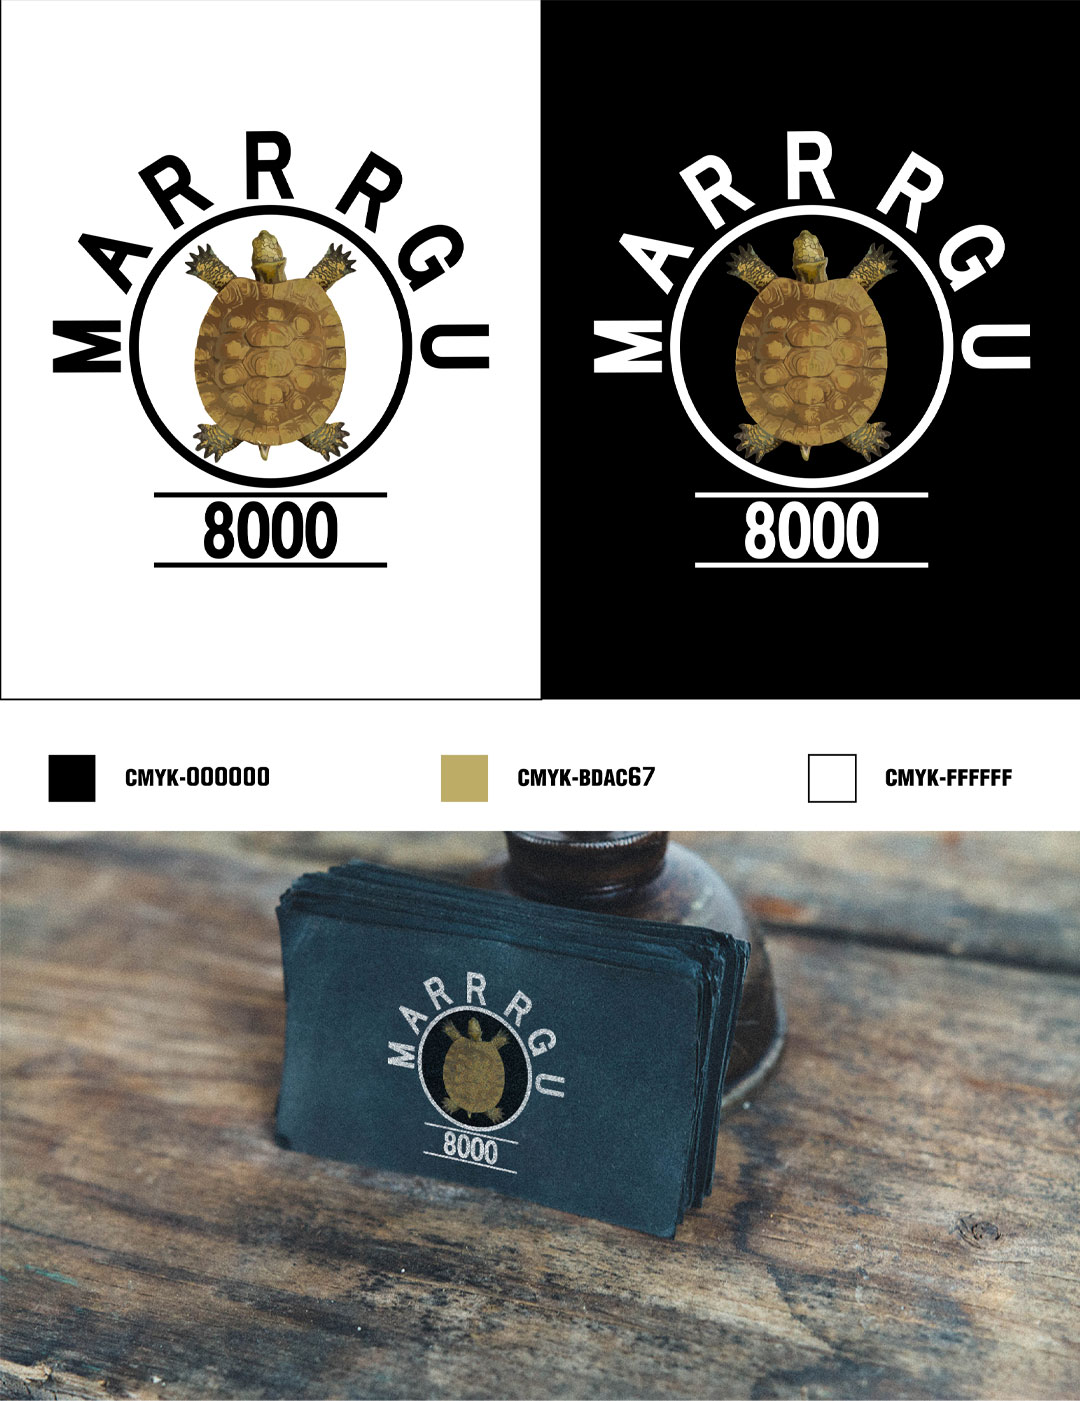 MARRRGU 8000